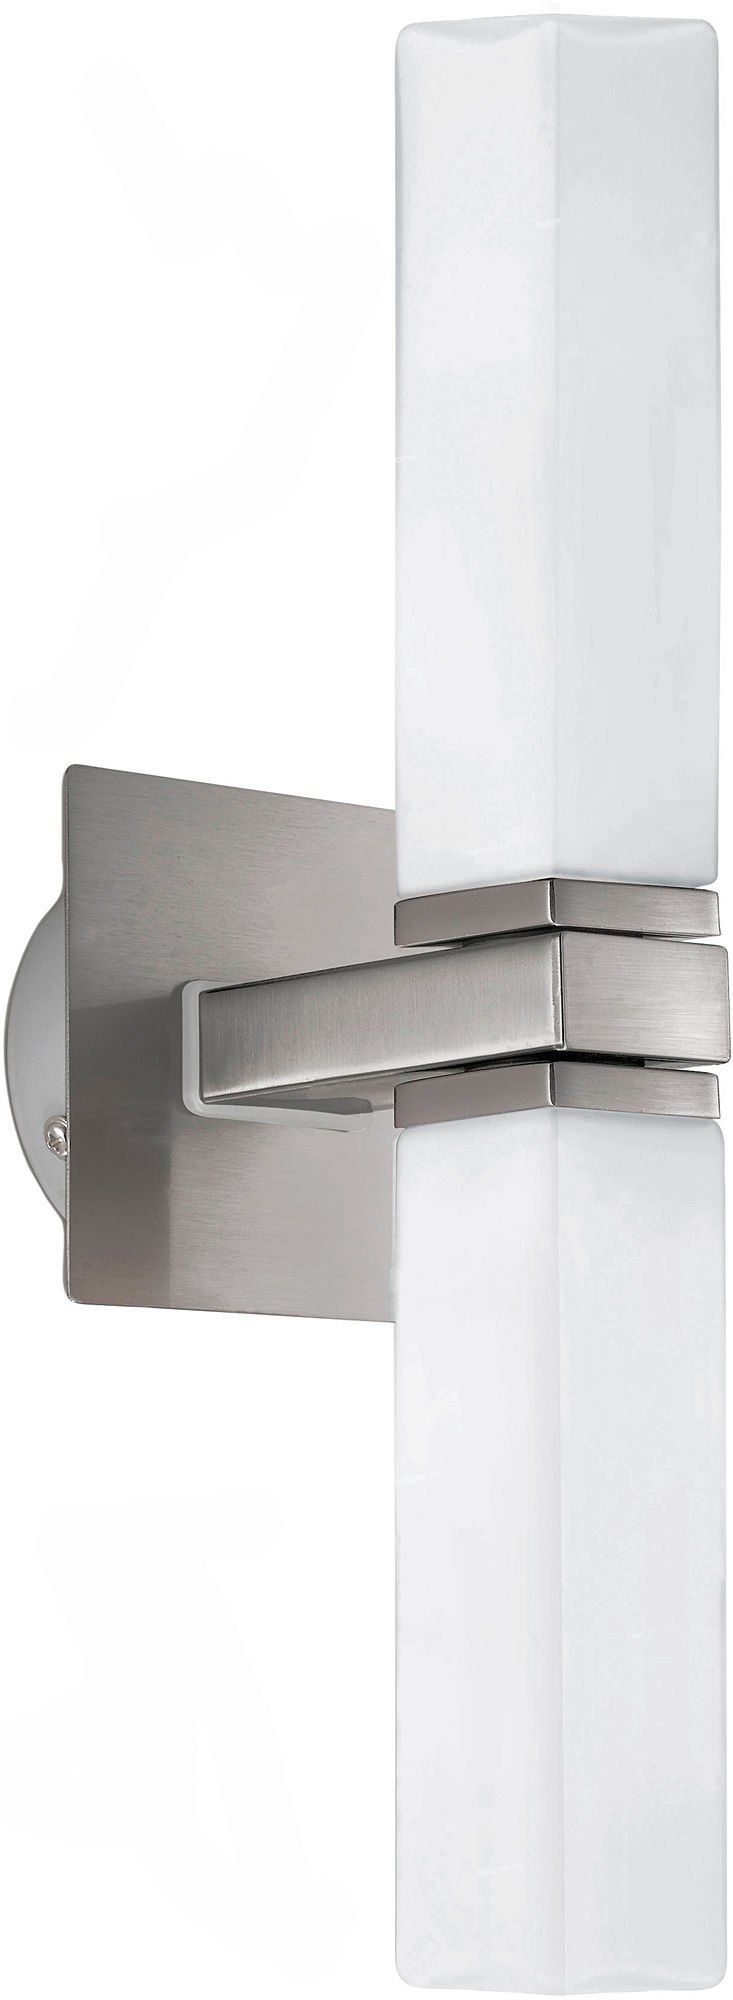 Светильник для ванной комнаты Eglo 88284-eg palermo